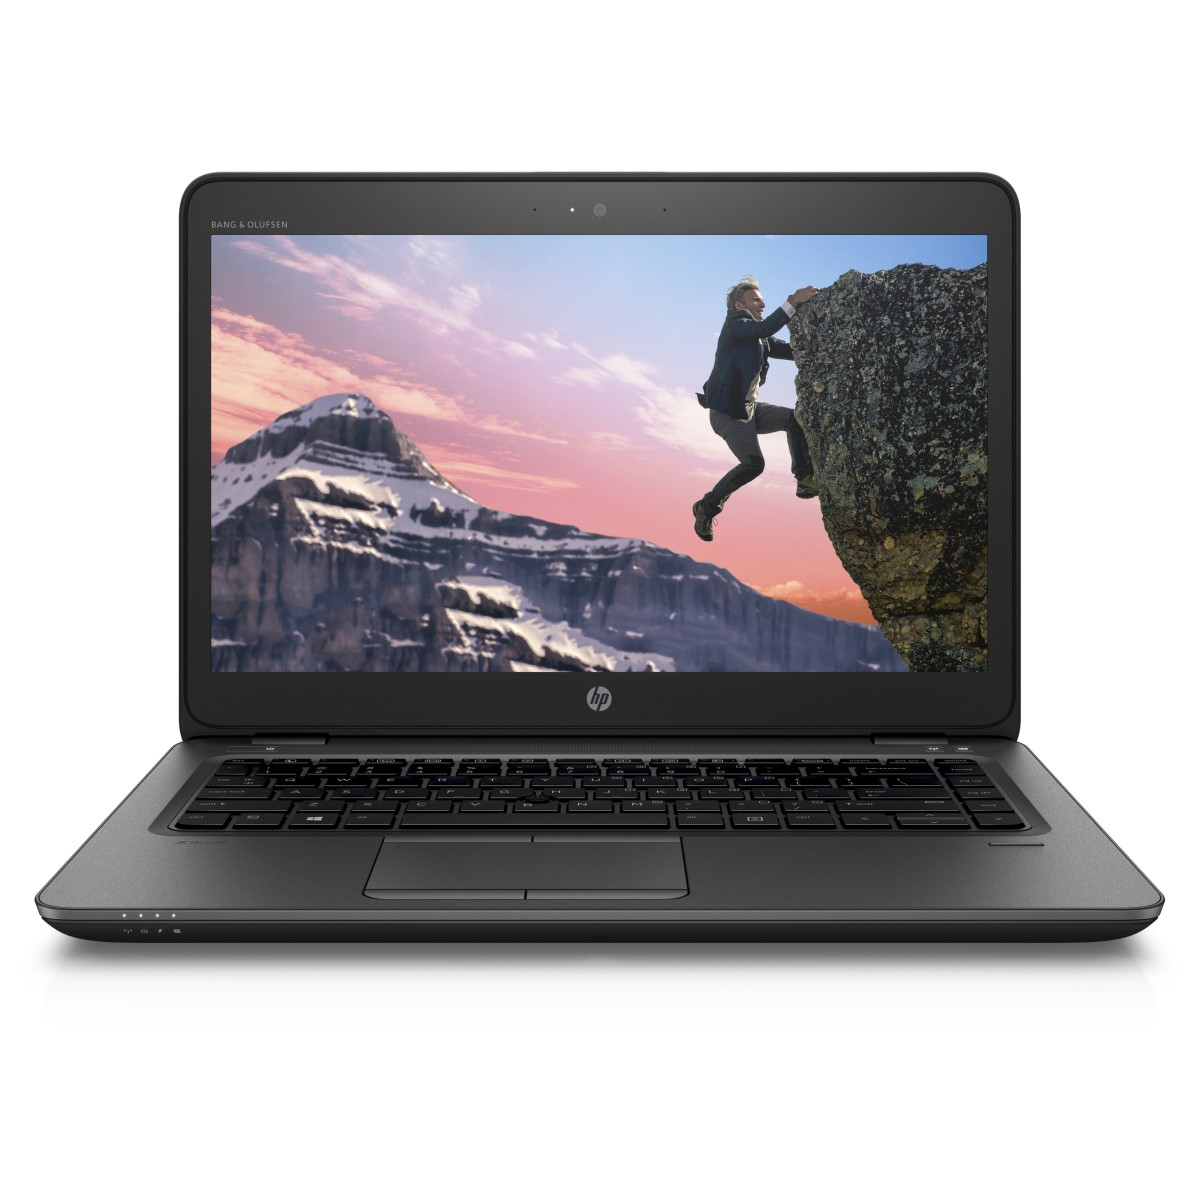 HP ZBook 14u G4 HD+/i5-7200U/8/500/AMD W4190M/VGA/HDMI/TB/RJ45/WIFI/BT/4G/MCR/FPR/3RServis/W10P